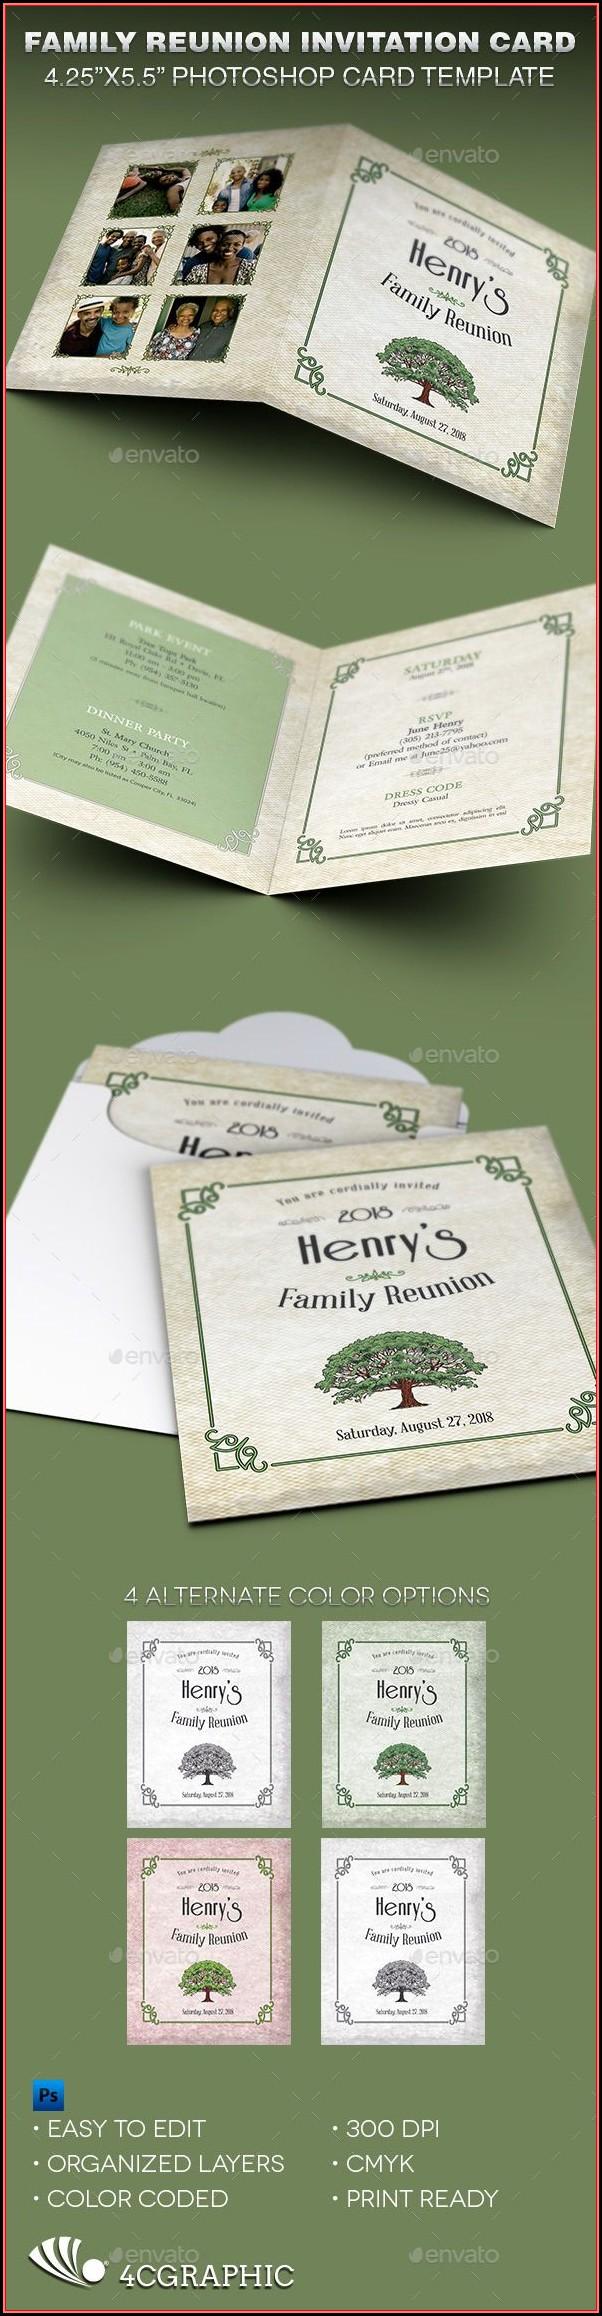 Family Reunion Invitation Card Templates